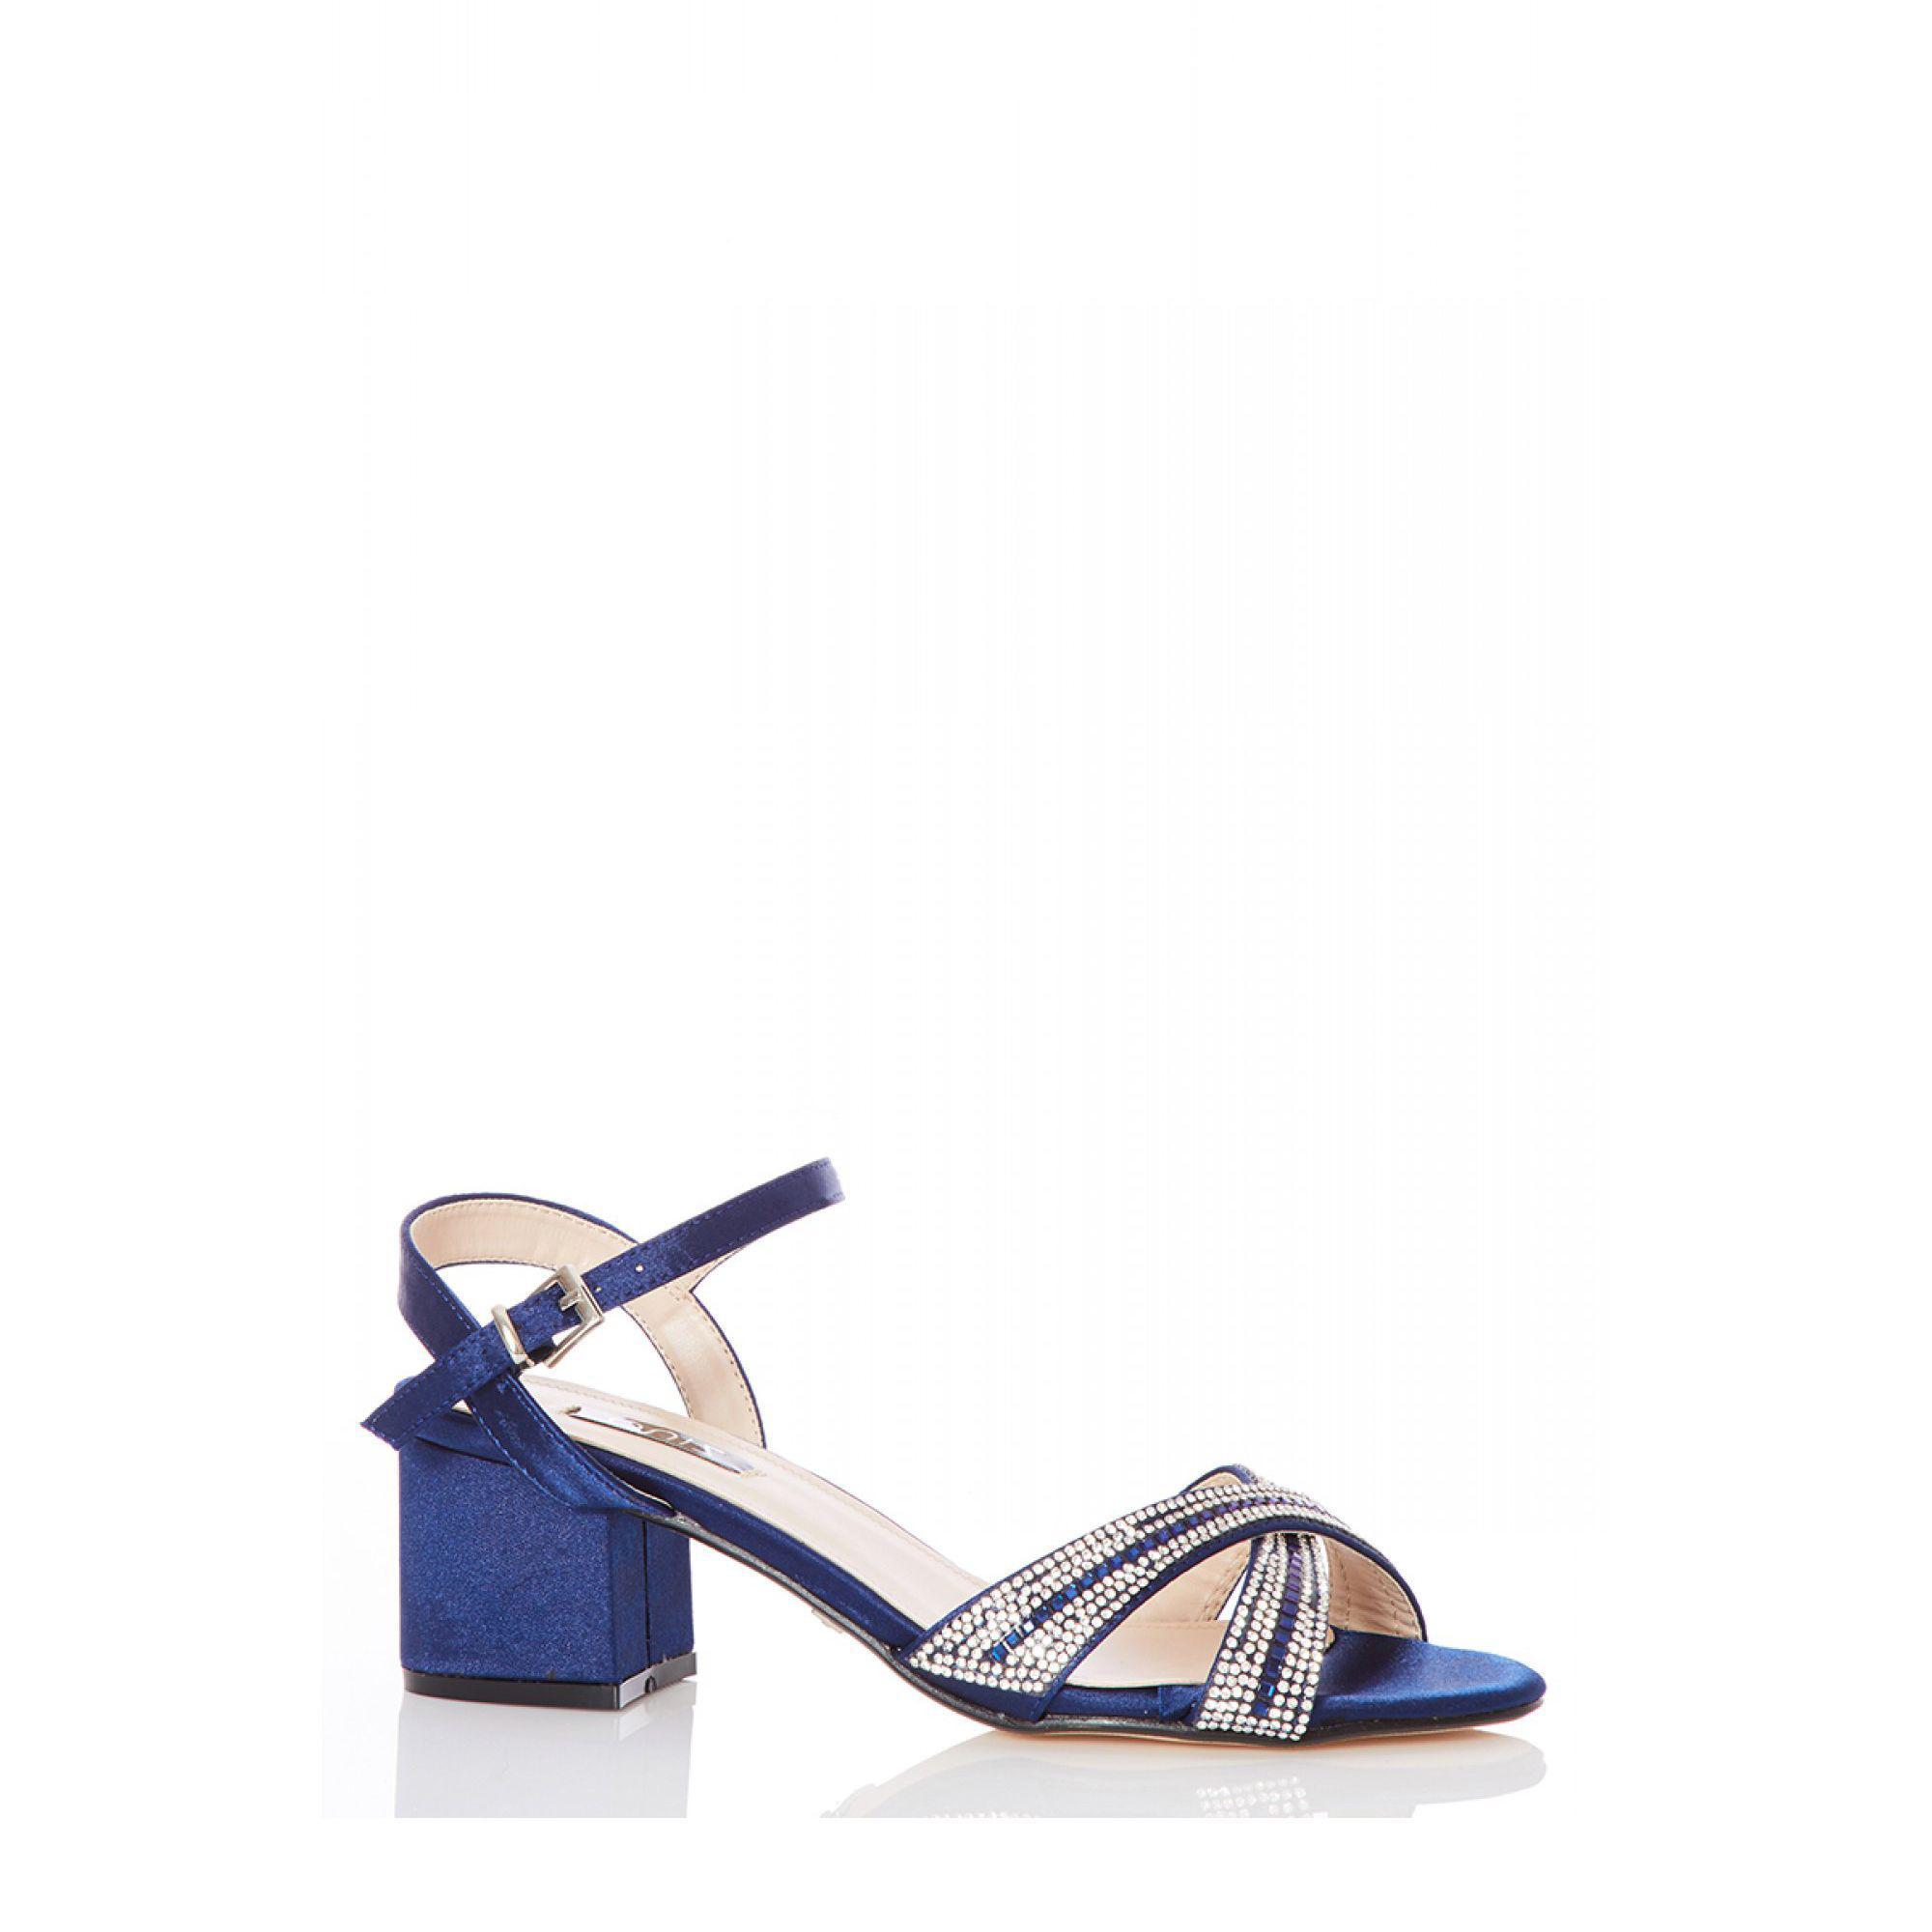 6cc1a7383 Quiz Navy Satin Diamante Mid Heels Sandals in Blue - Lyst